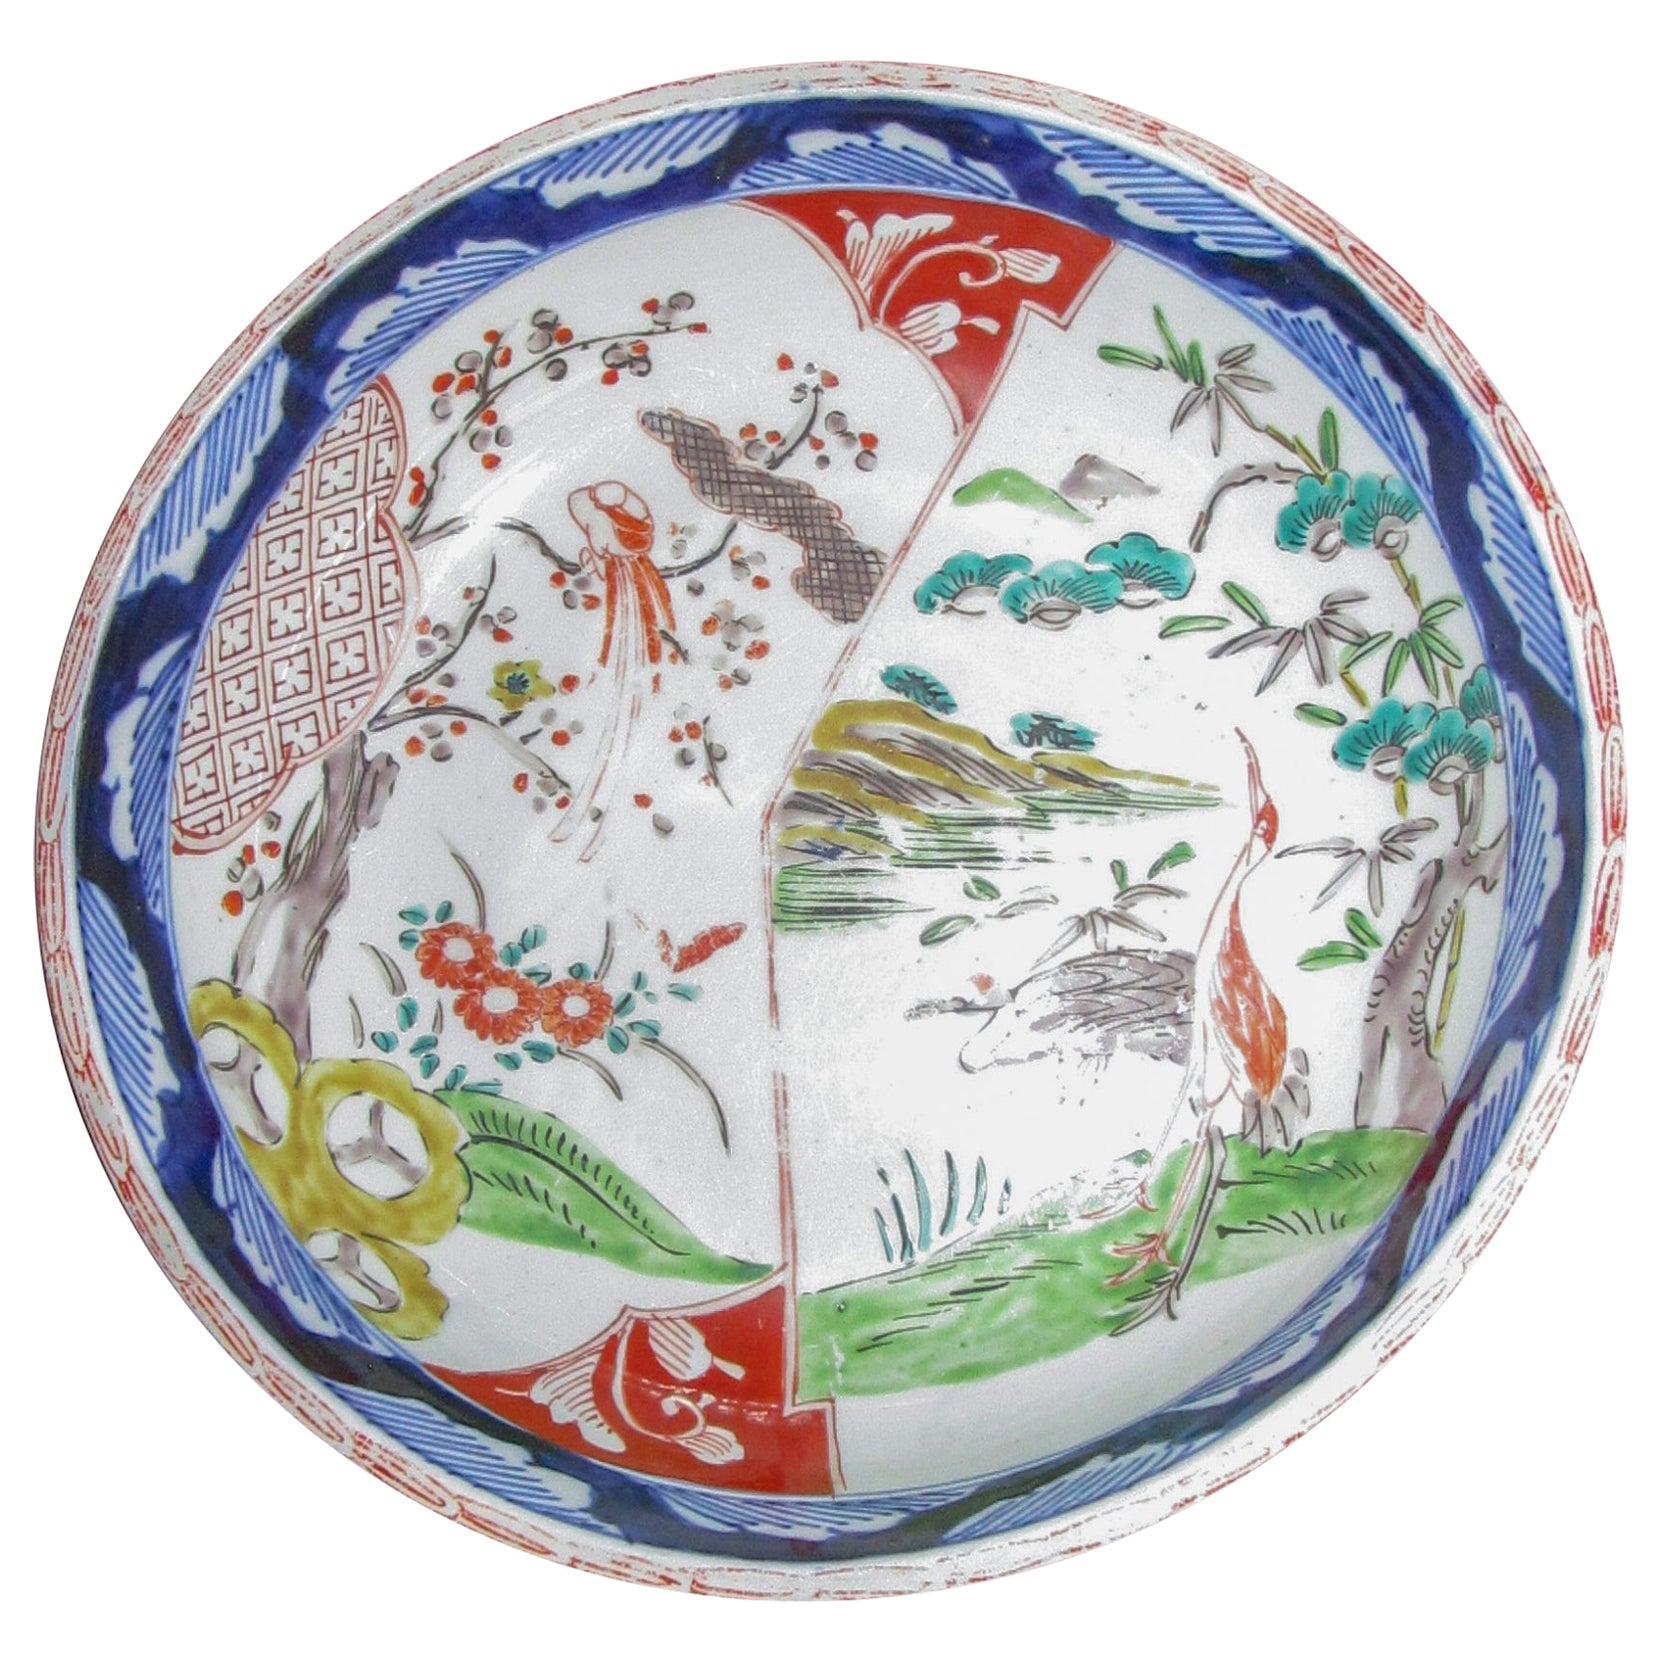 19th Century Imari Japanese Meiji Bowl with Crane Motif